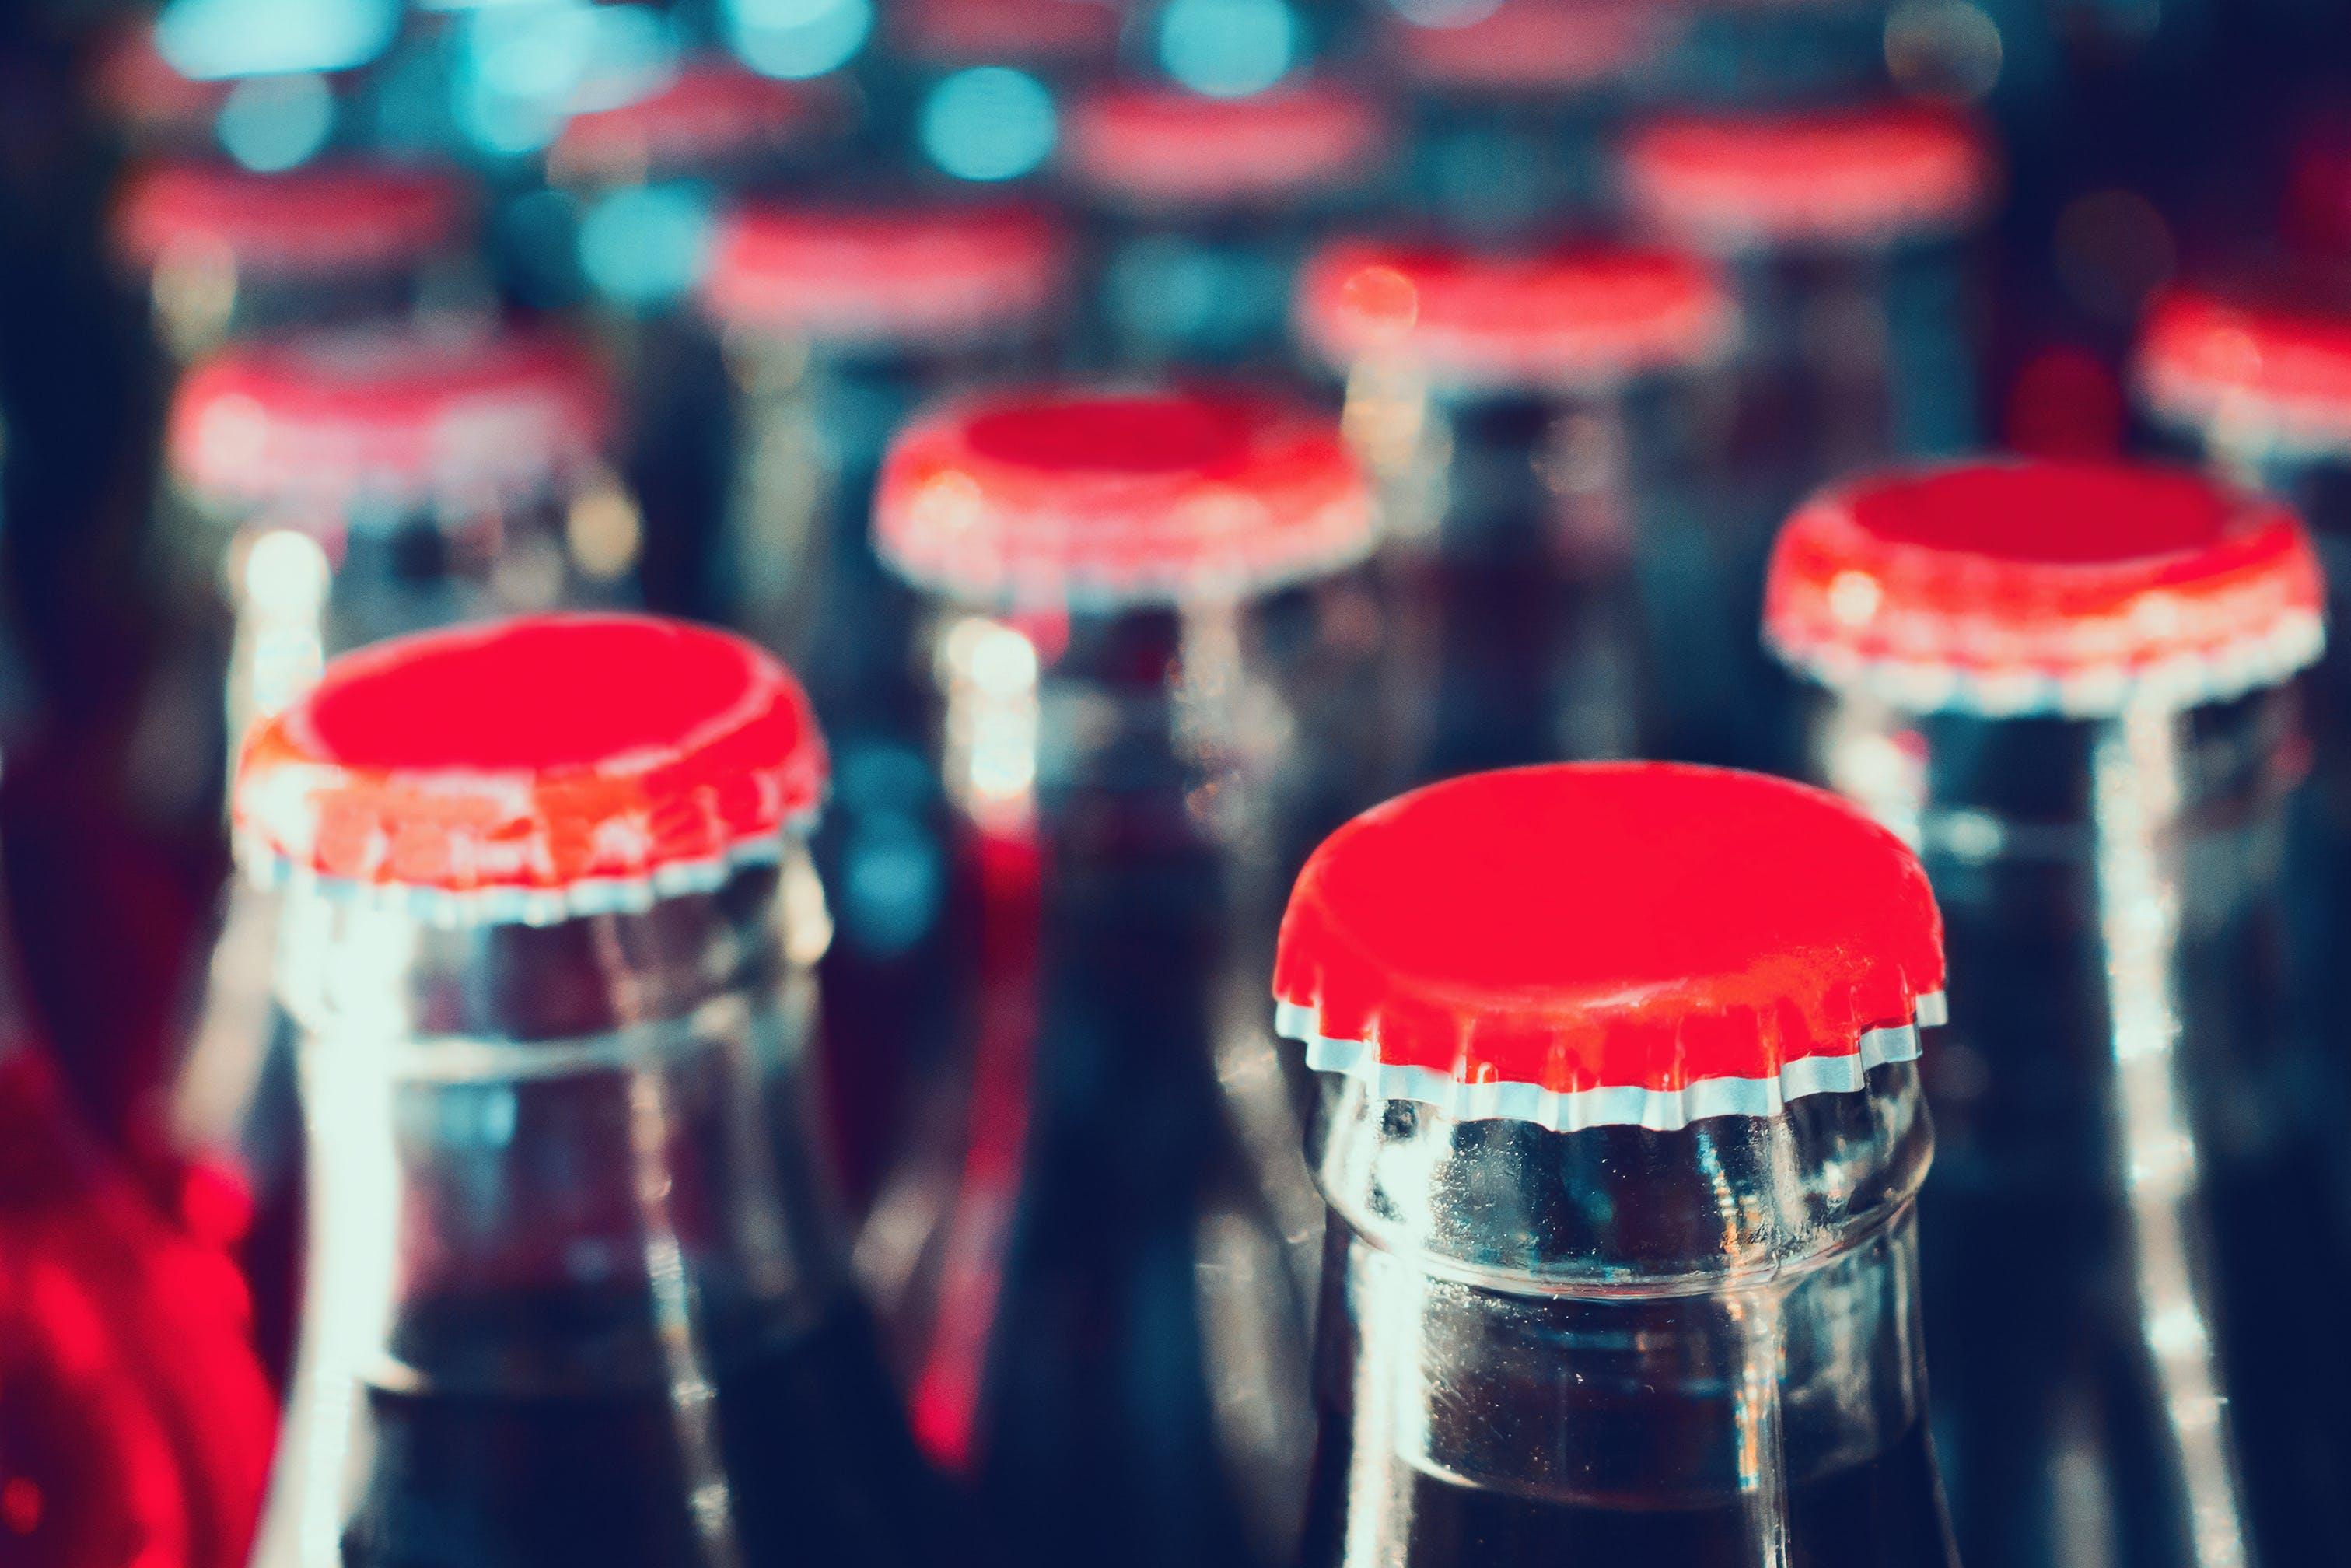 Coke's war with the public health community